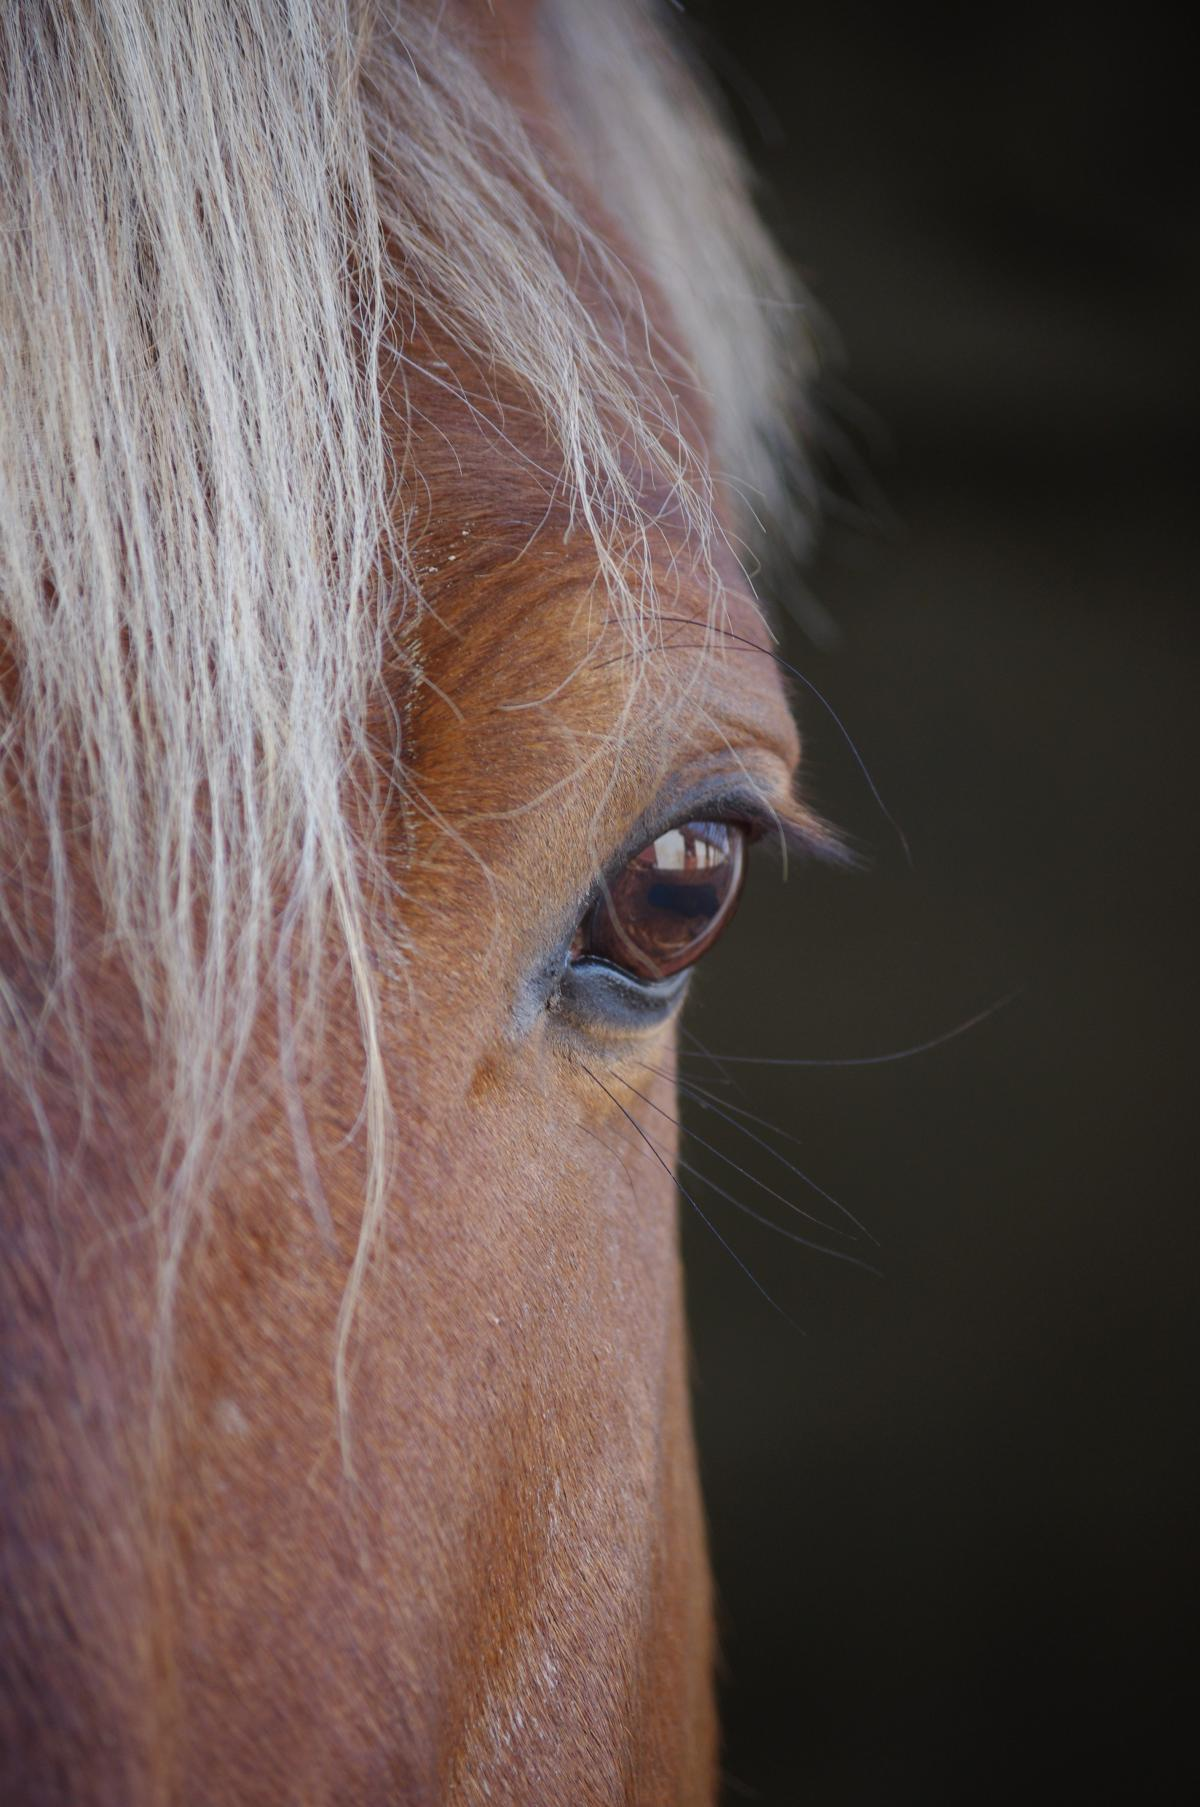 Close-up Photo of Horse